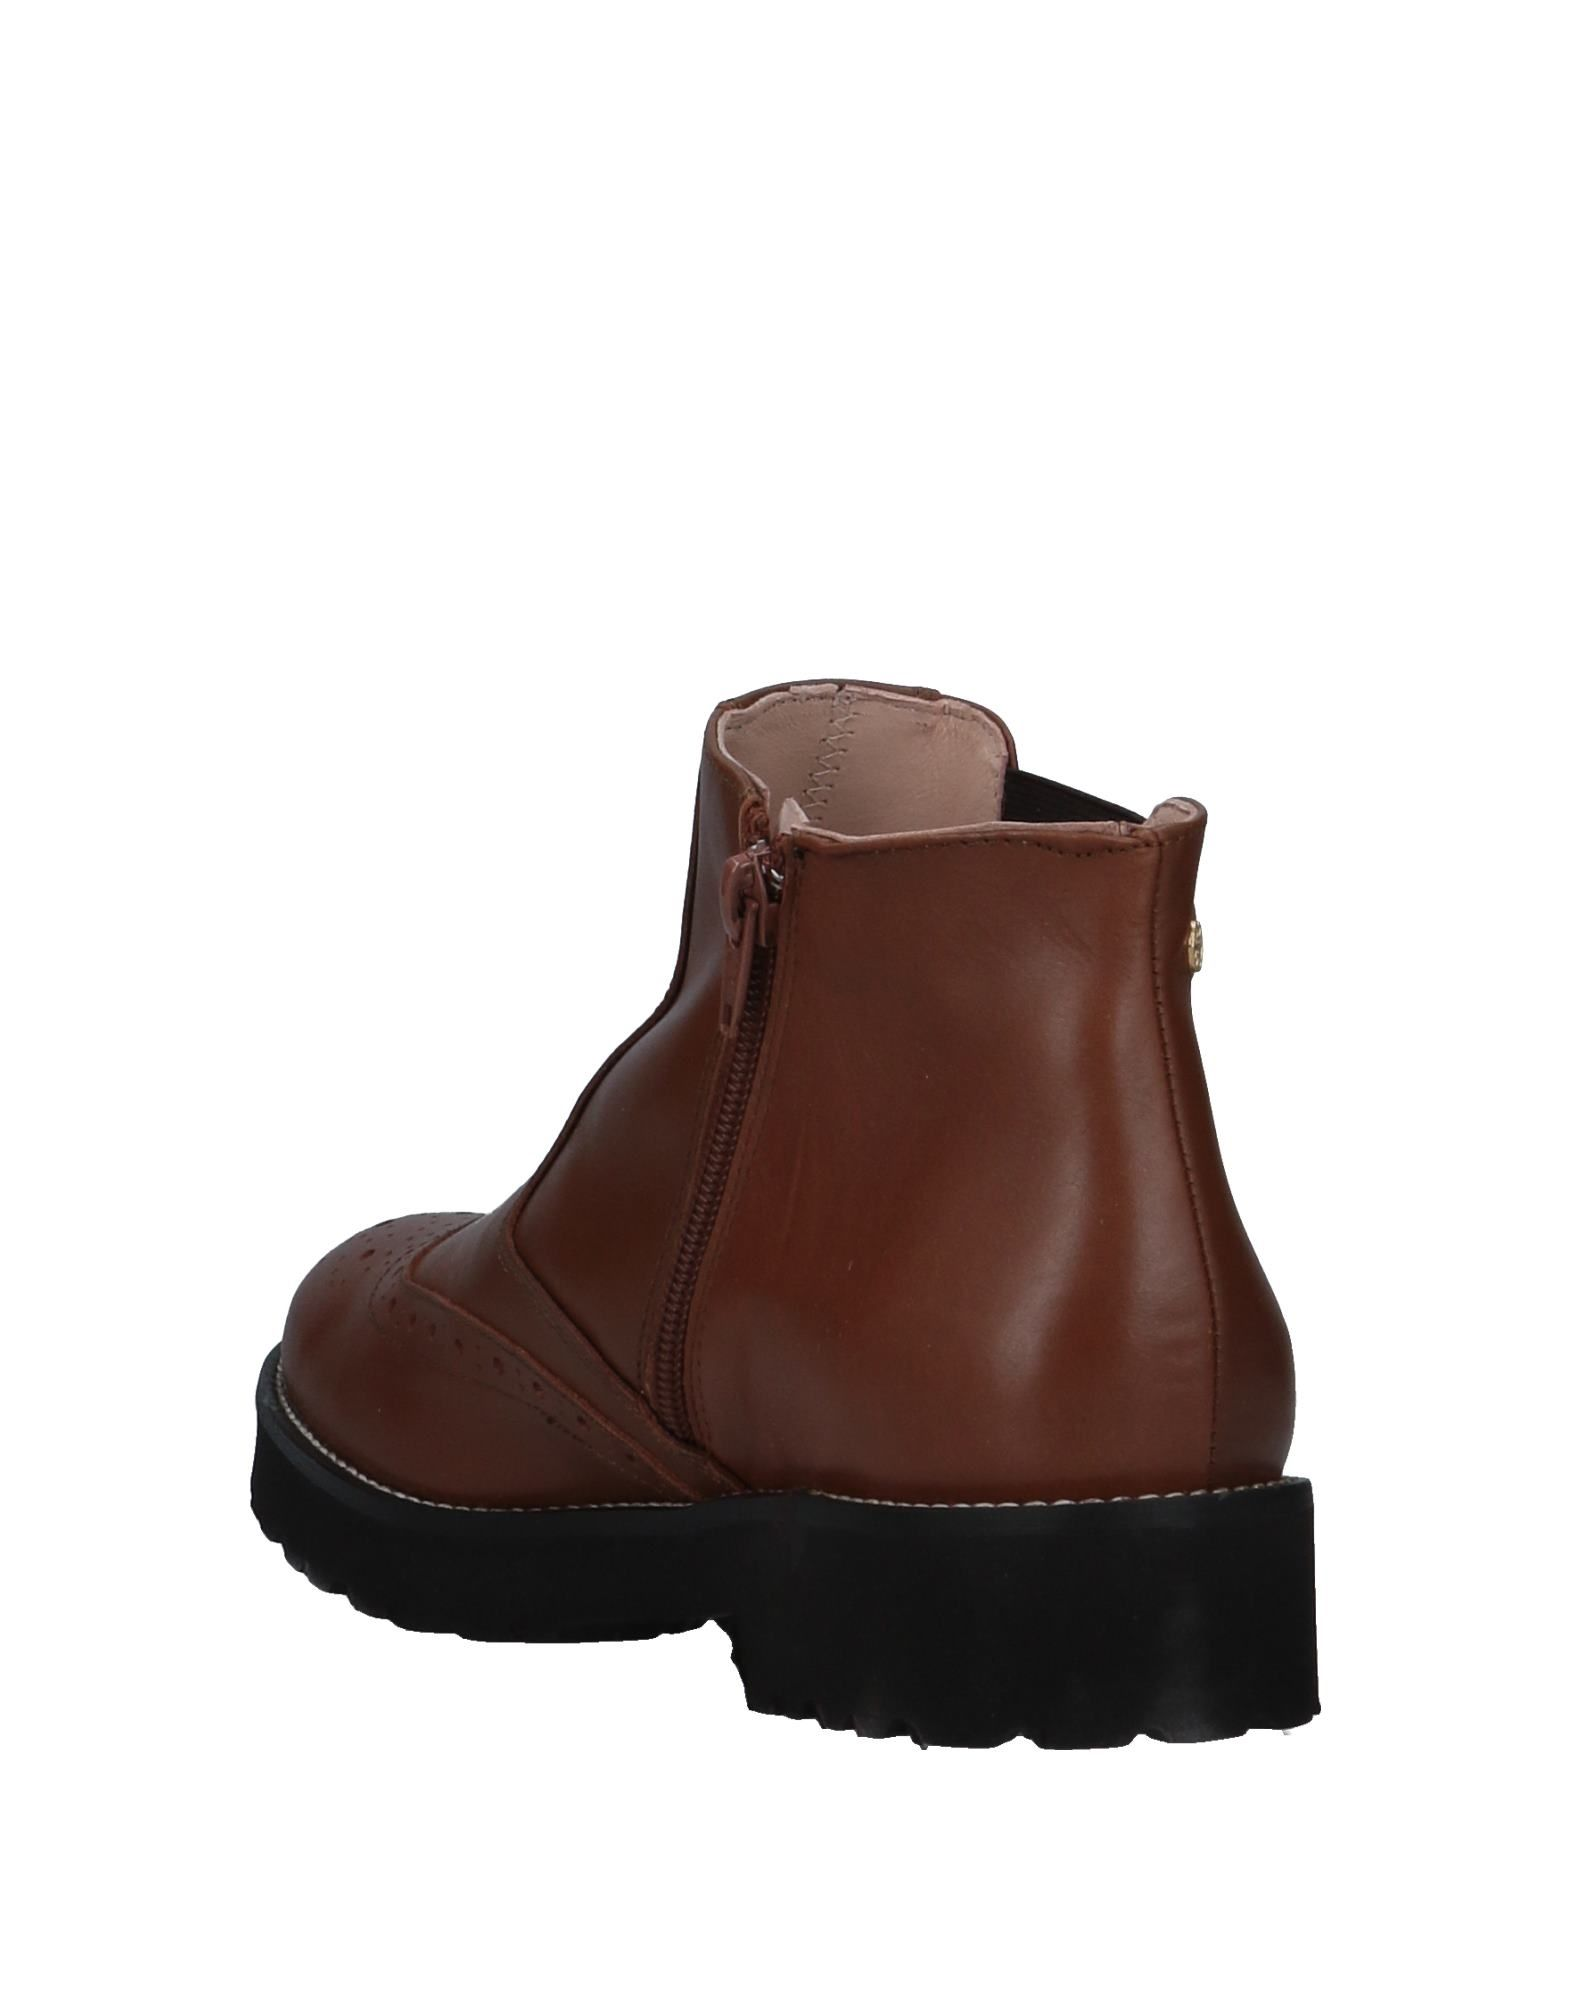 Cuplé Cuplé Cuplé Stiefelette Damen  11541279UQ Gute Qualität beliebte Schuhe 5d3c91